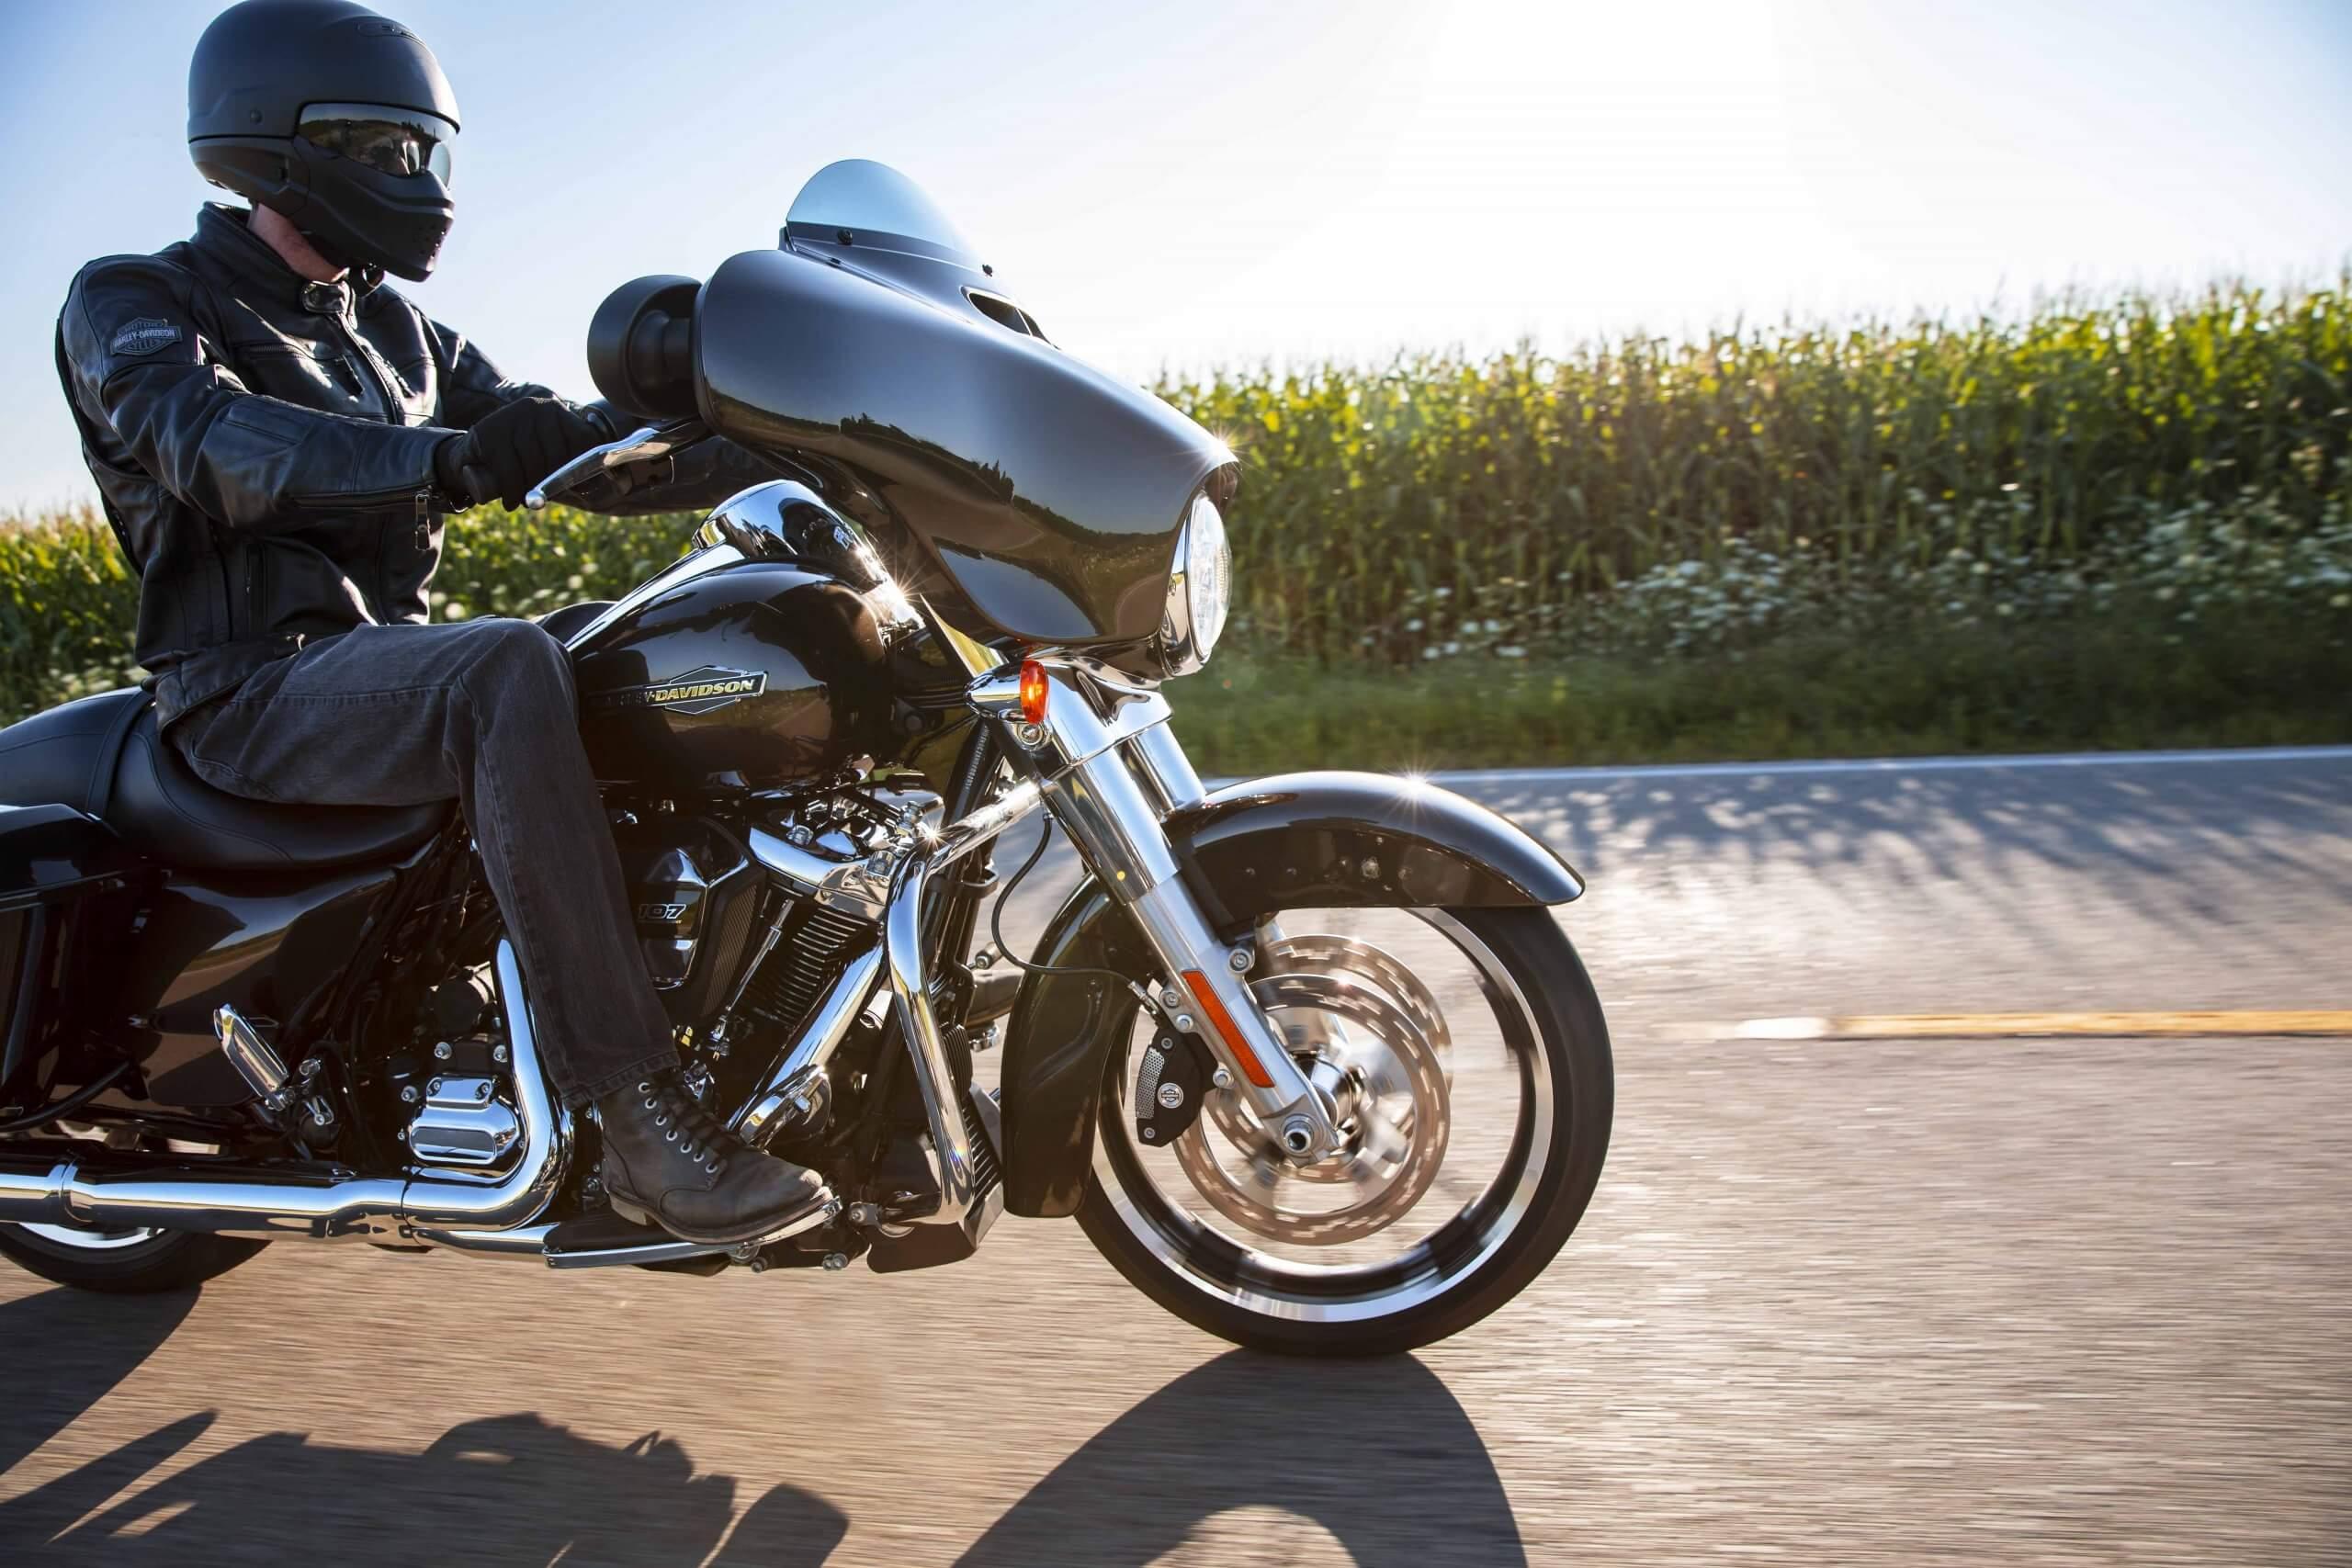 Riders seeking a showstopping custom bagger